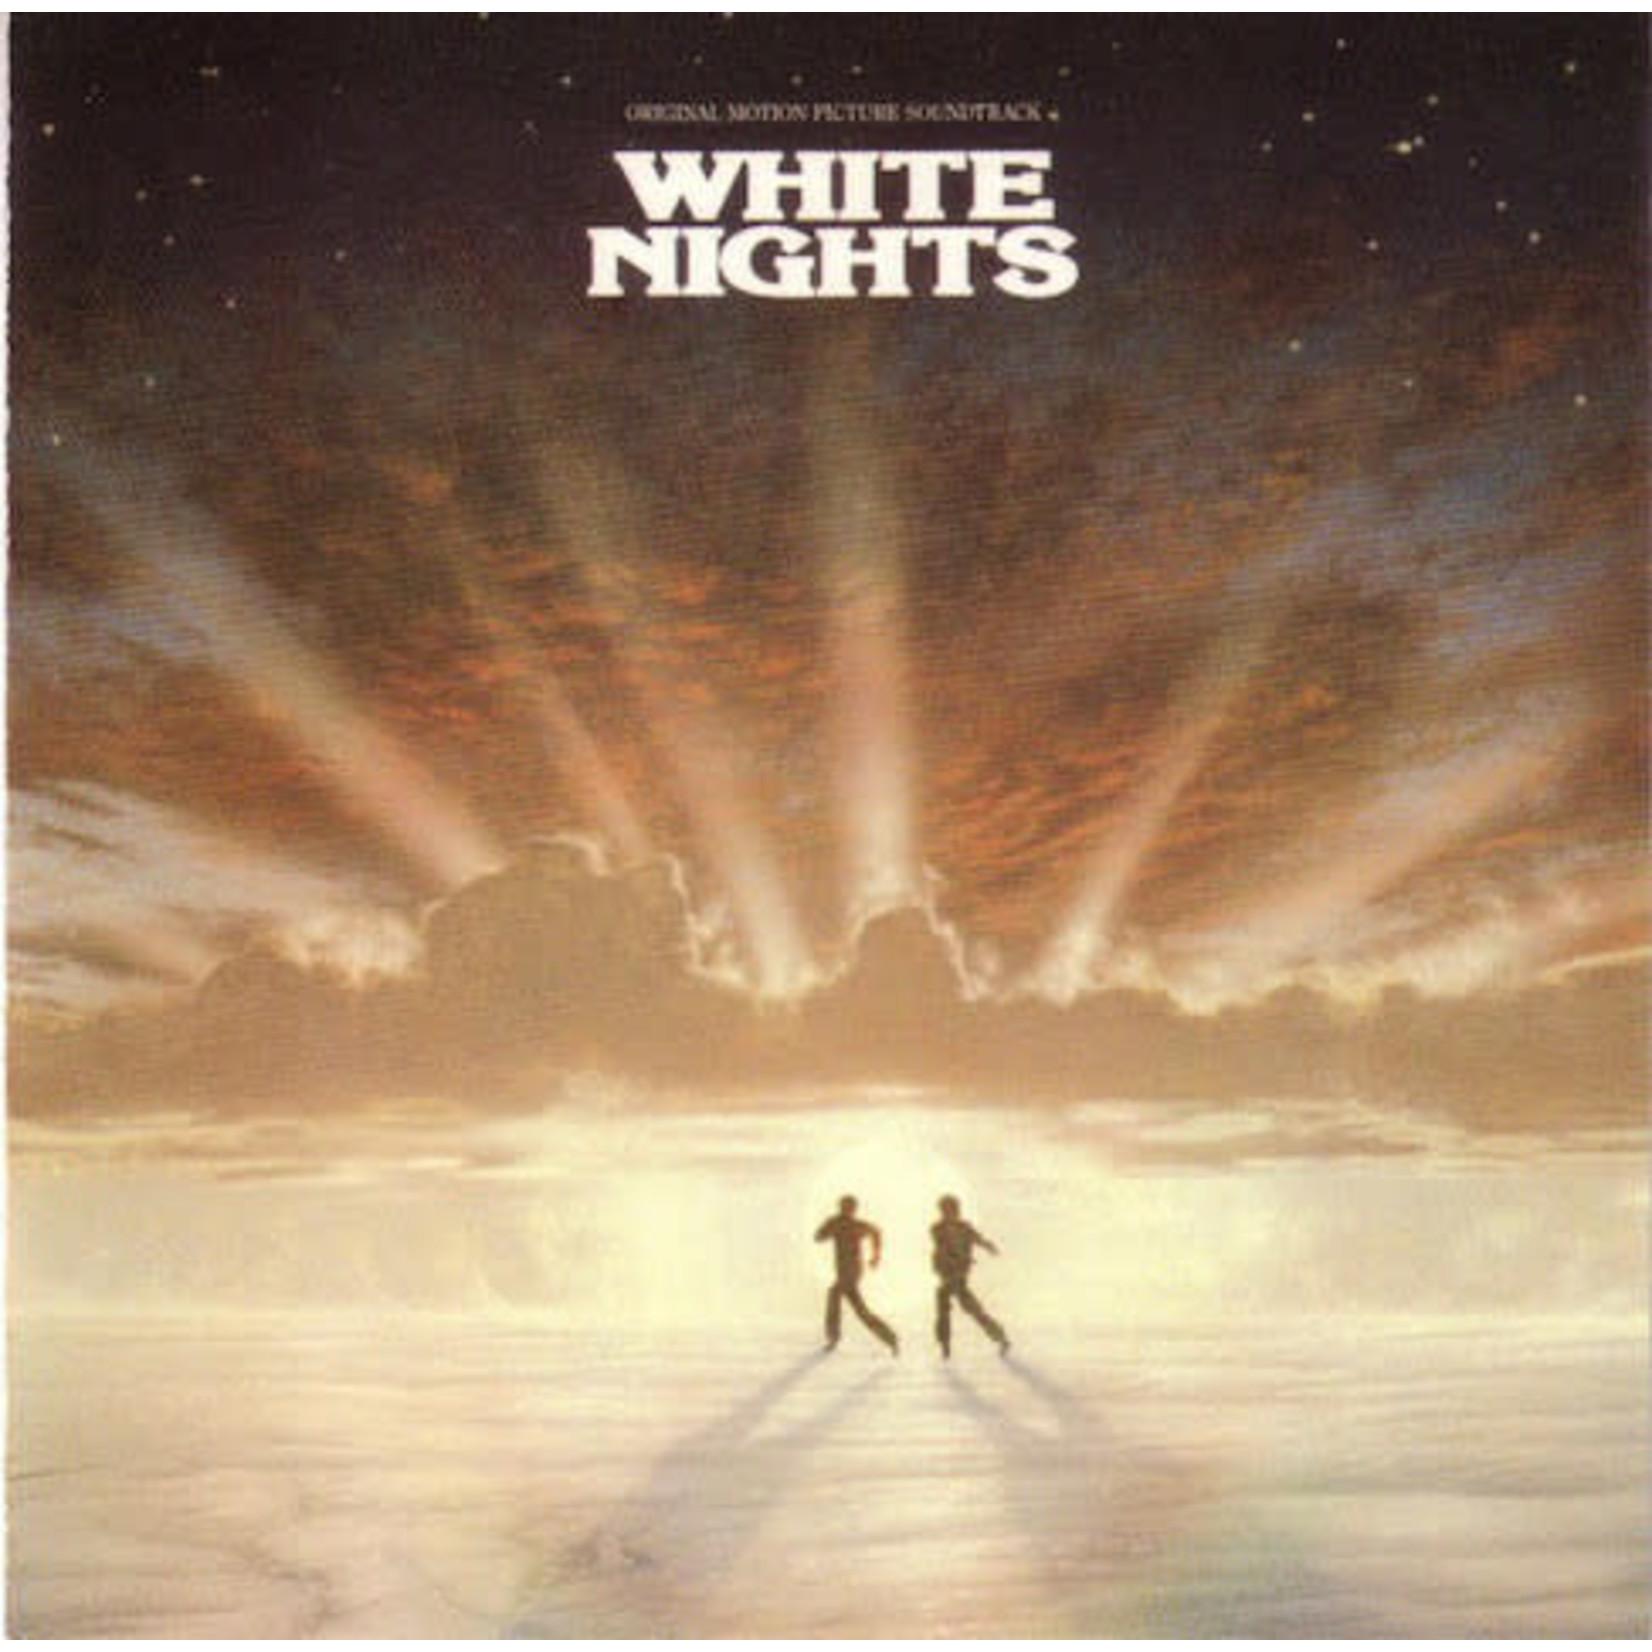 [Vintage] Various: White Nights (Soundtrack)